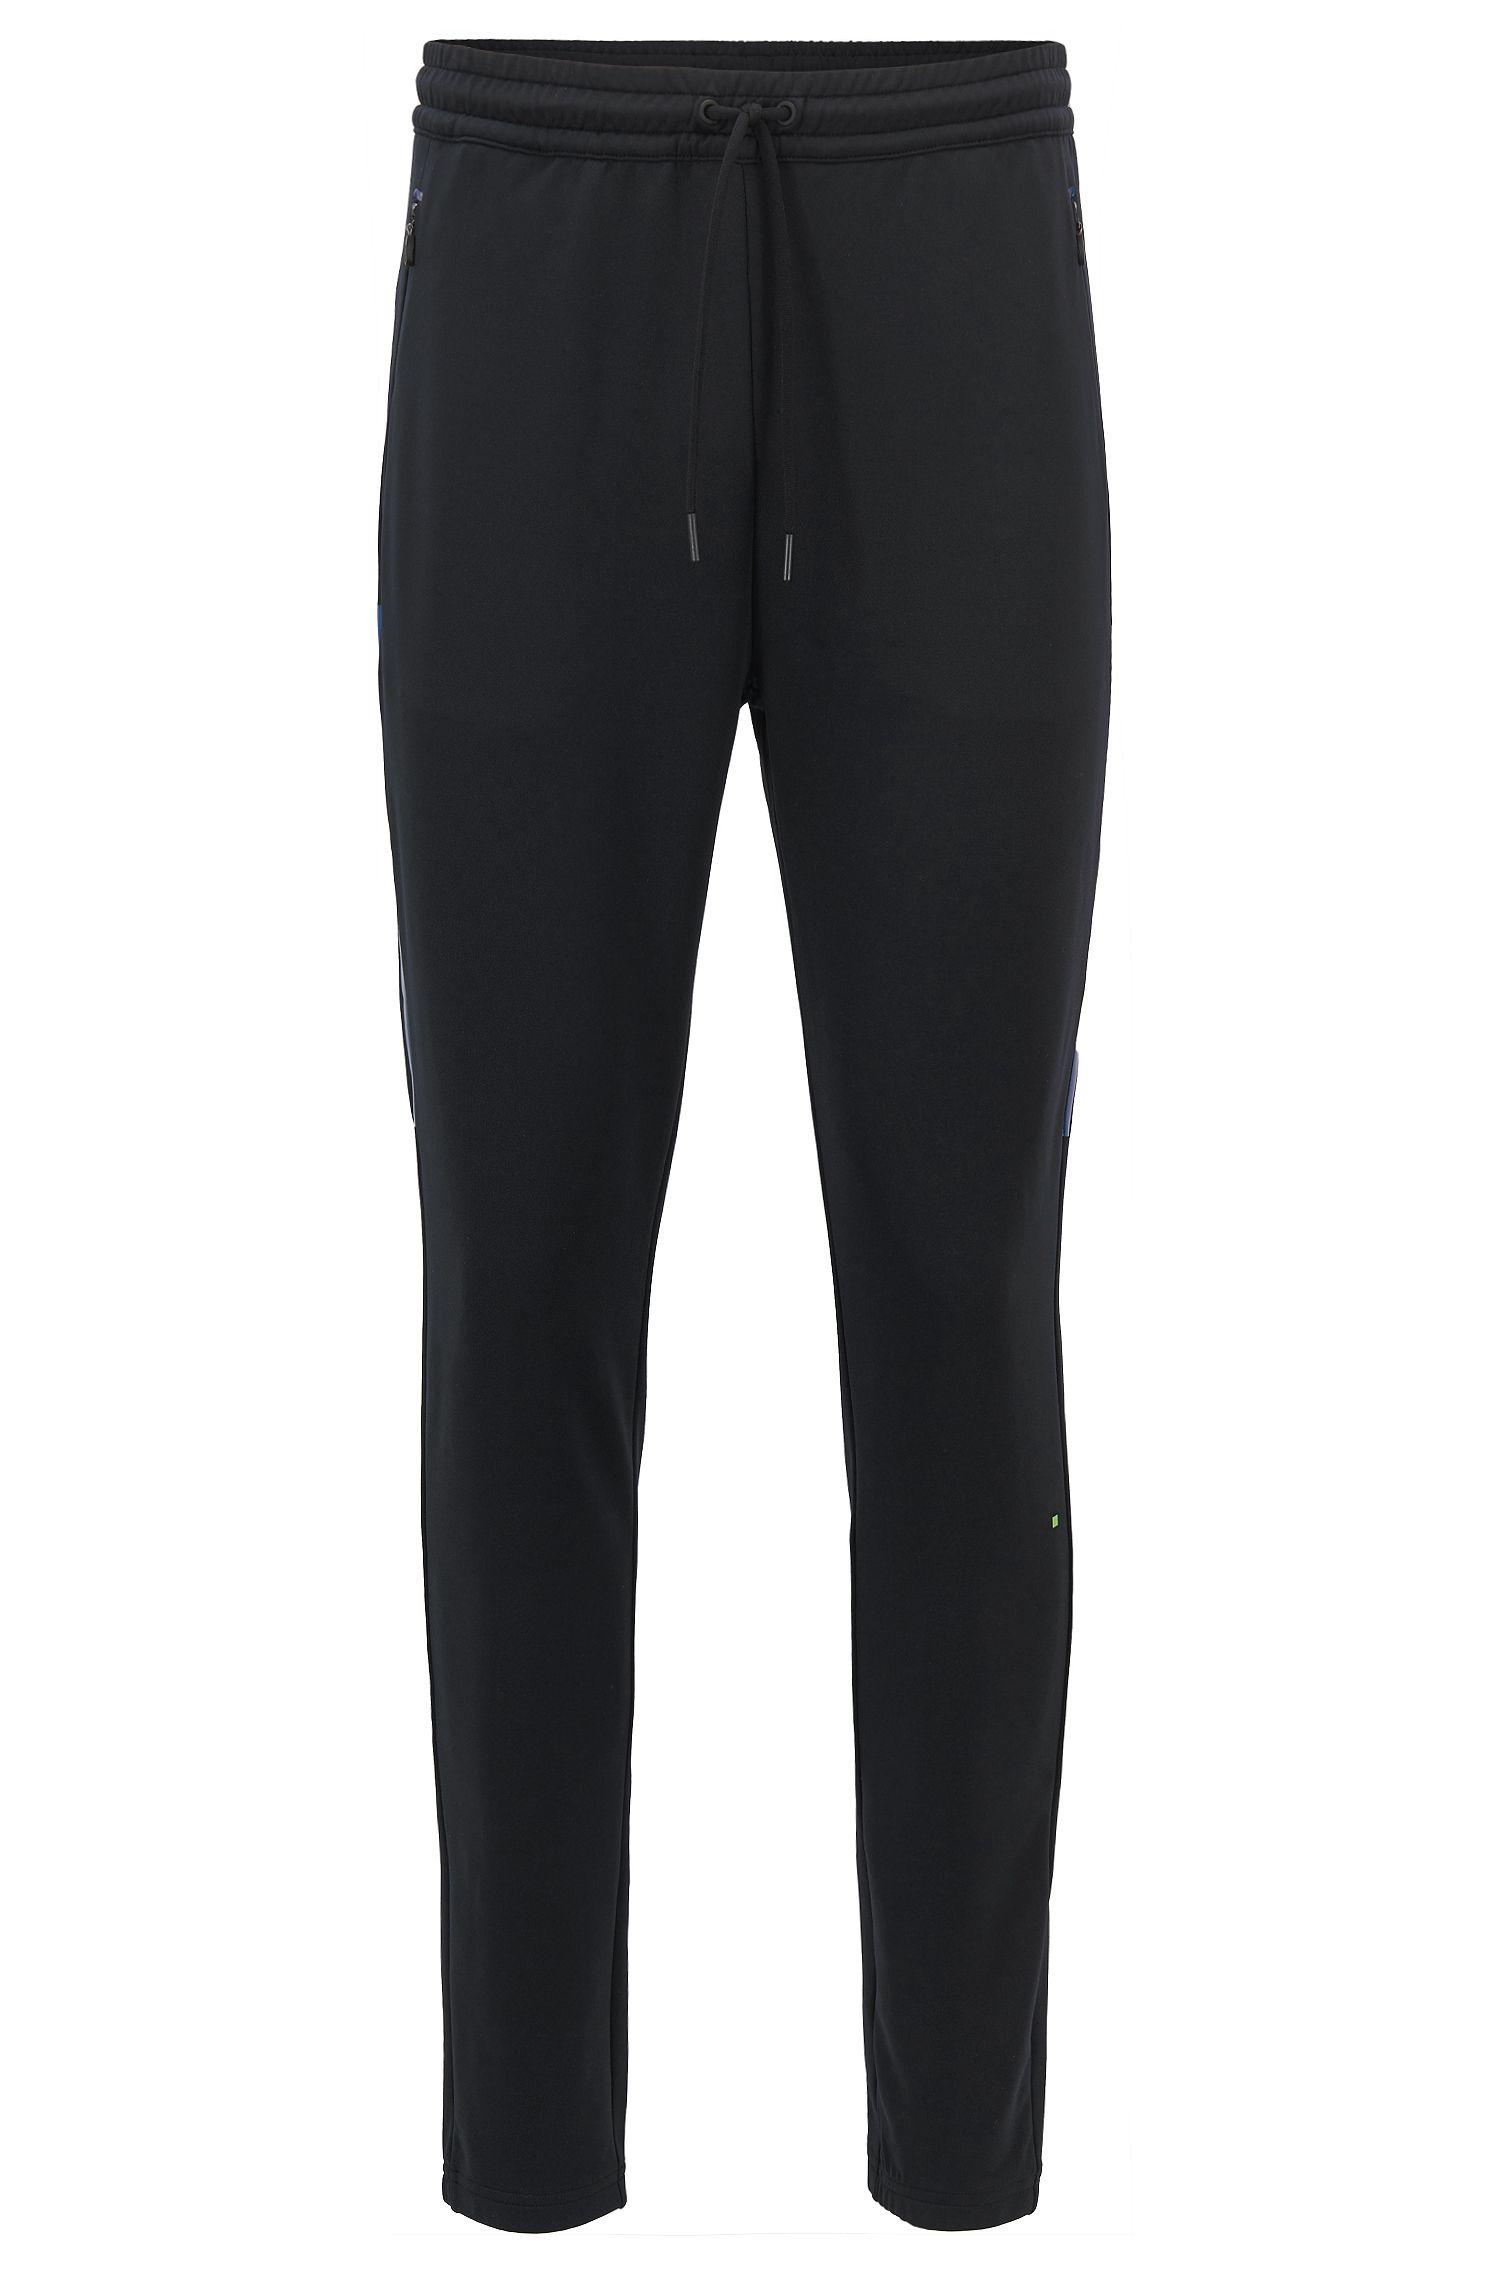 Pantalon de jogging en tissu technique avec la fibre S.Café®